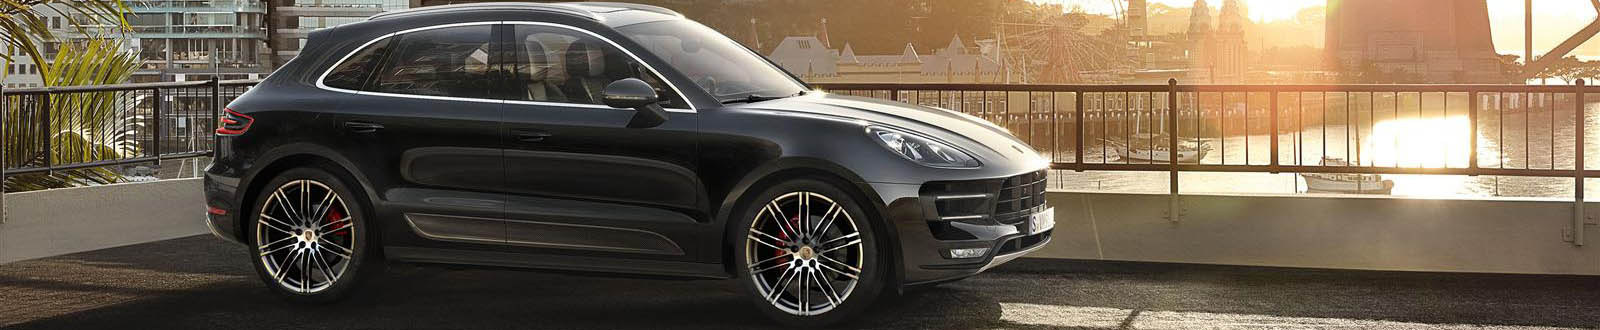 Suncoast Porsche Parts Accessories Macan Turbo